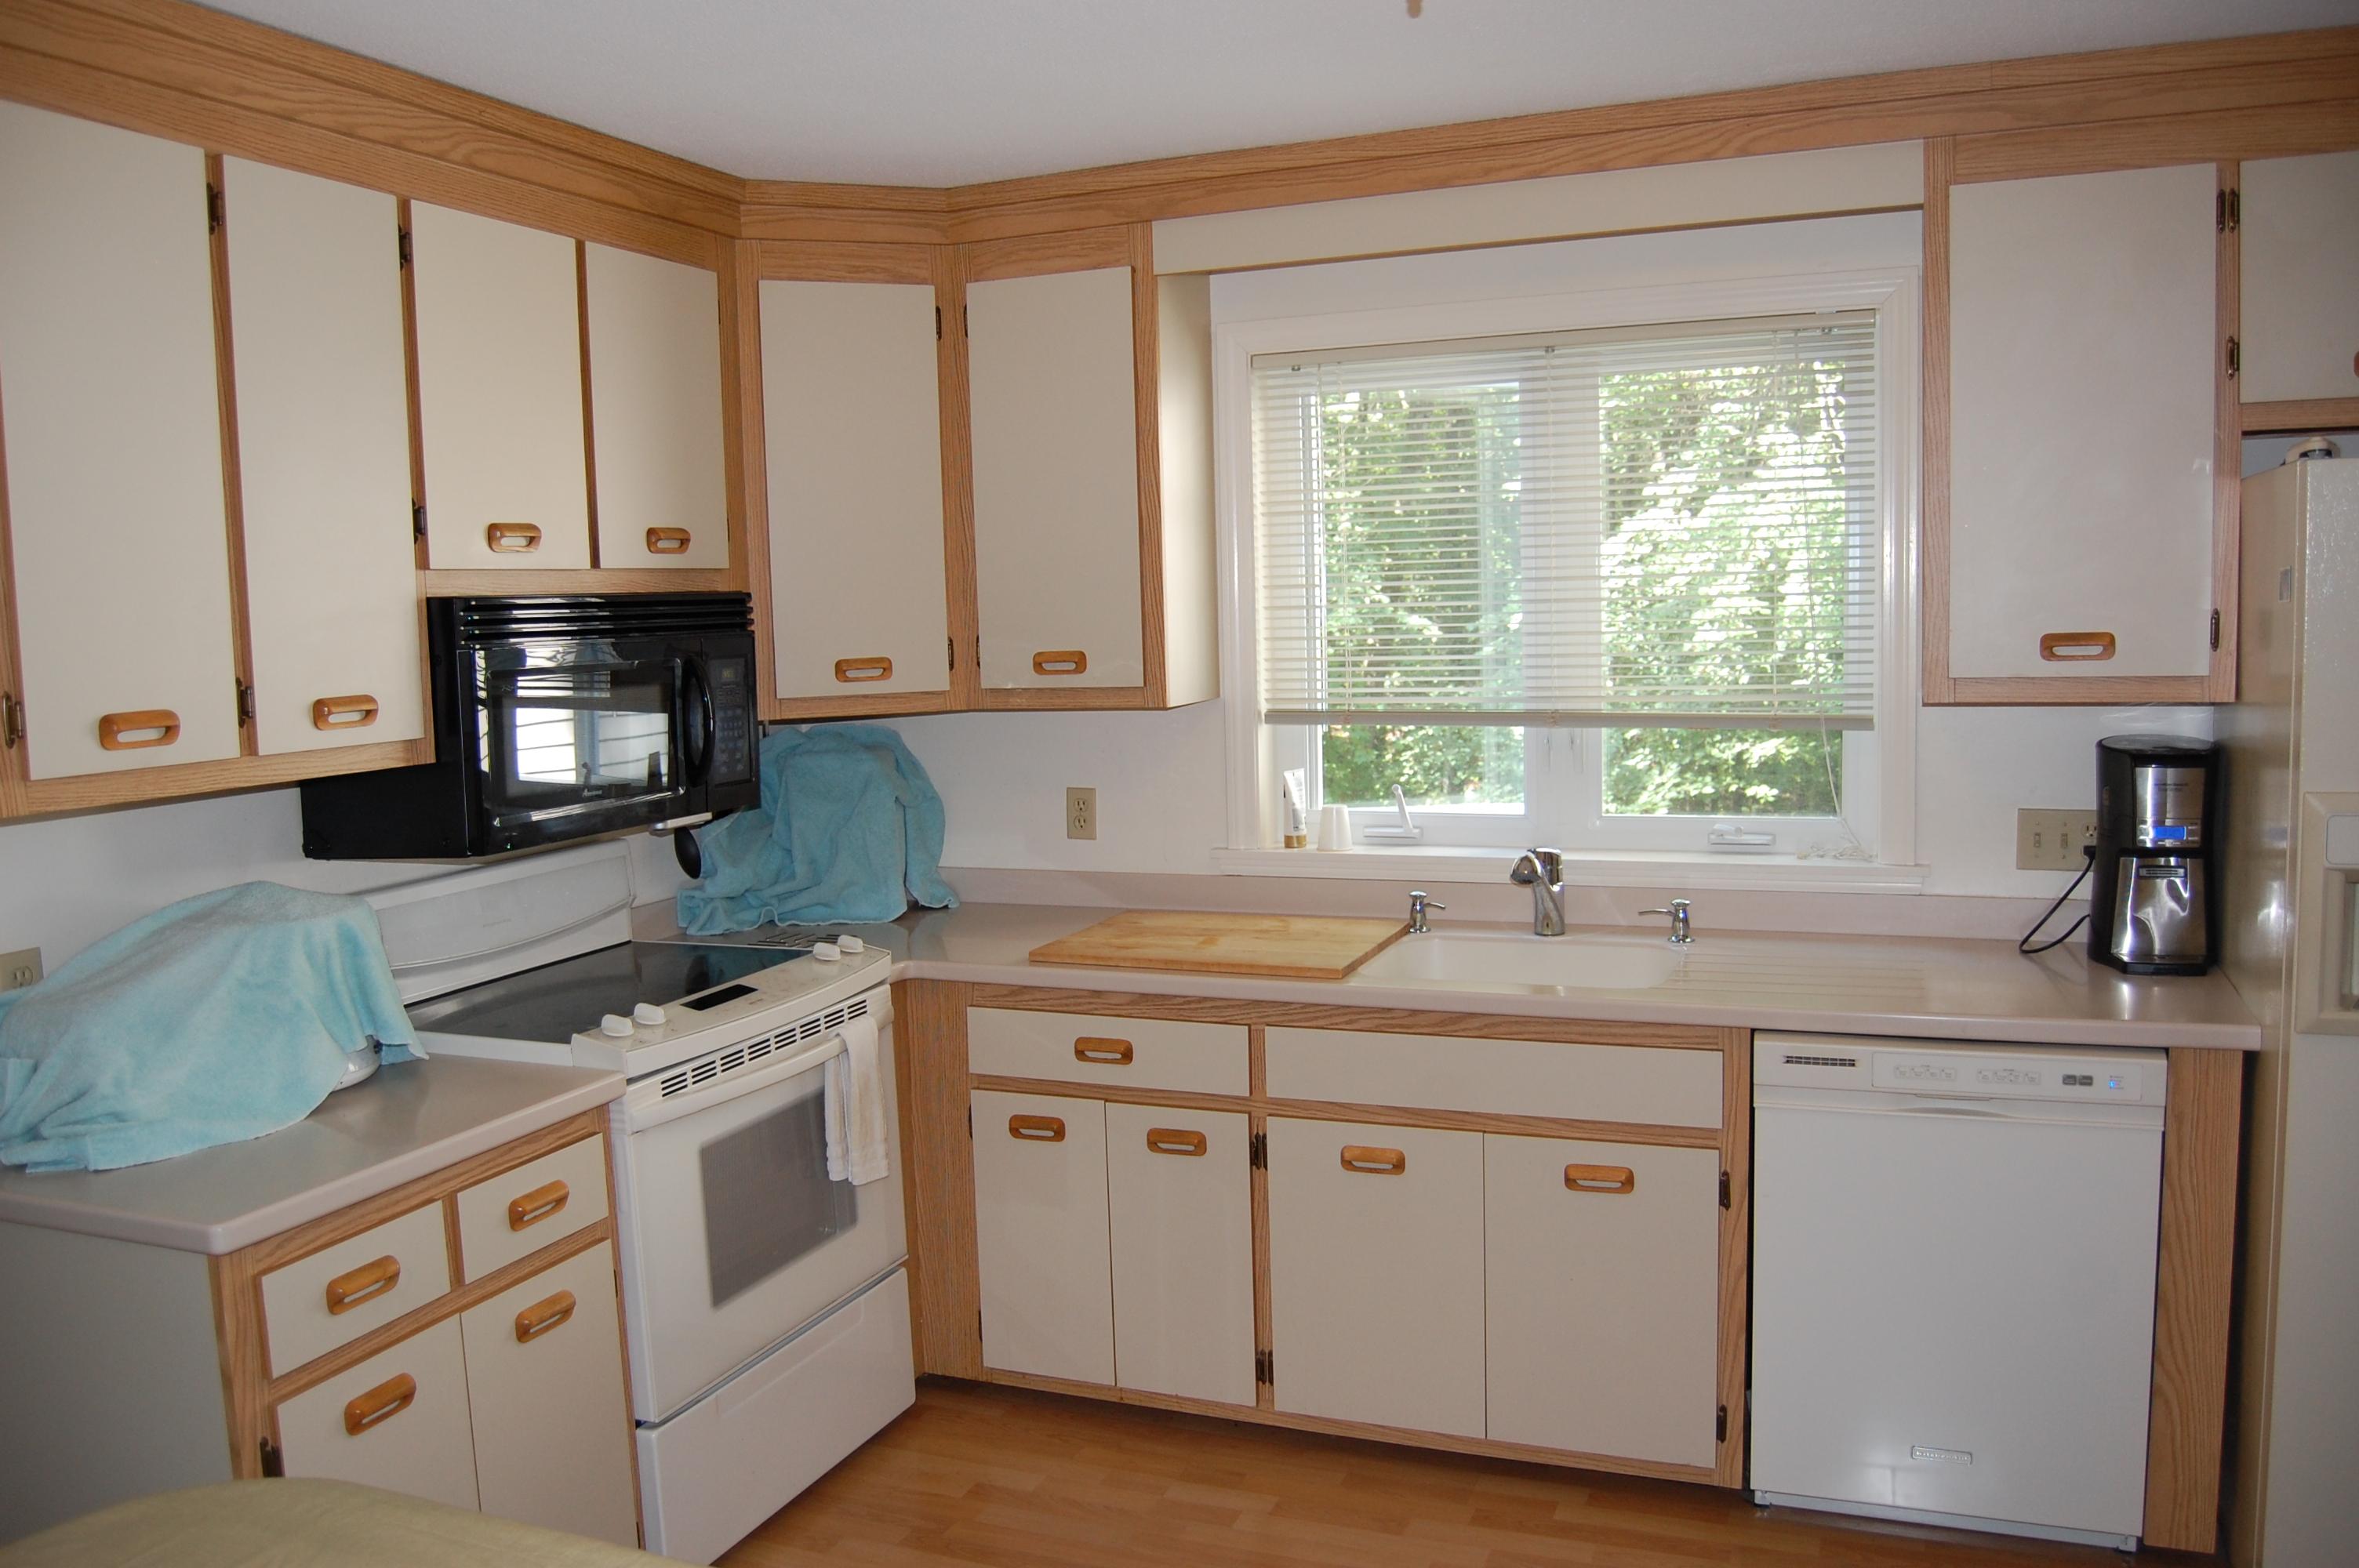 refacing oak kitchen cabinets to white kitchen cabinets refacing December Narendraenterprises